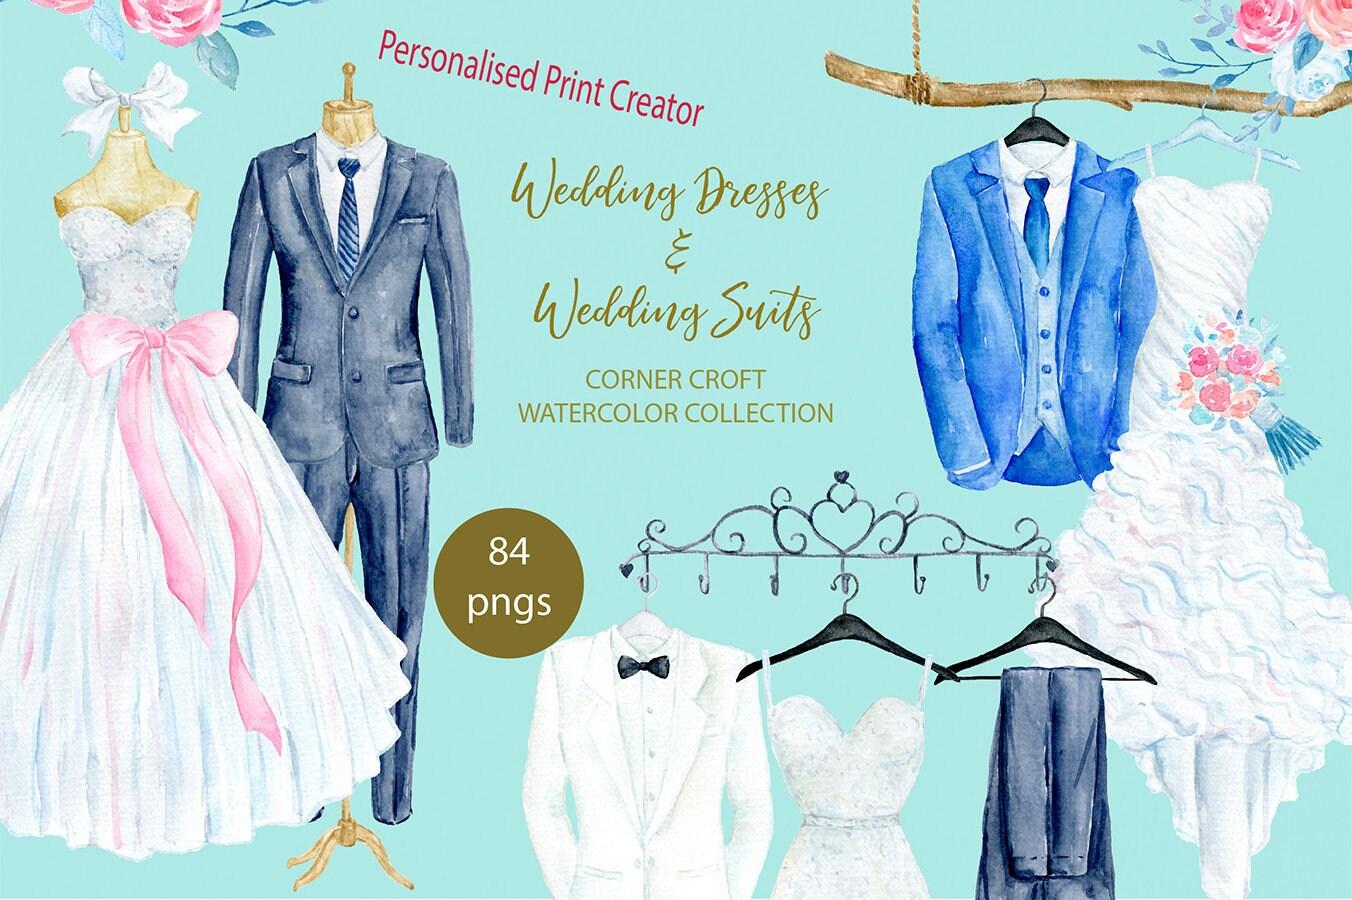 Watercolor wedding dress wedding suit personalised print | Etsy